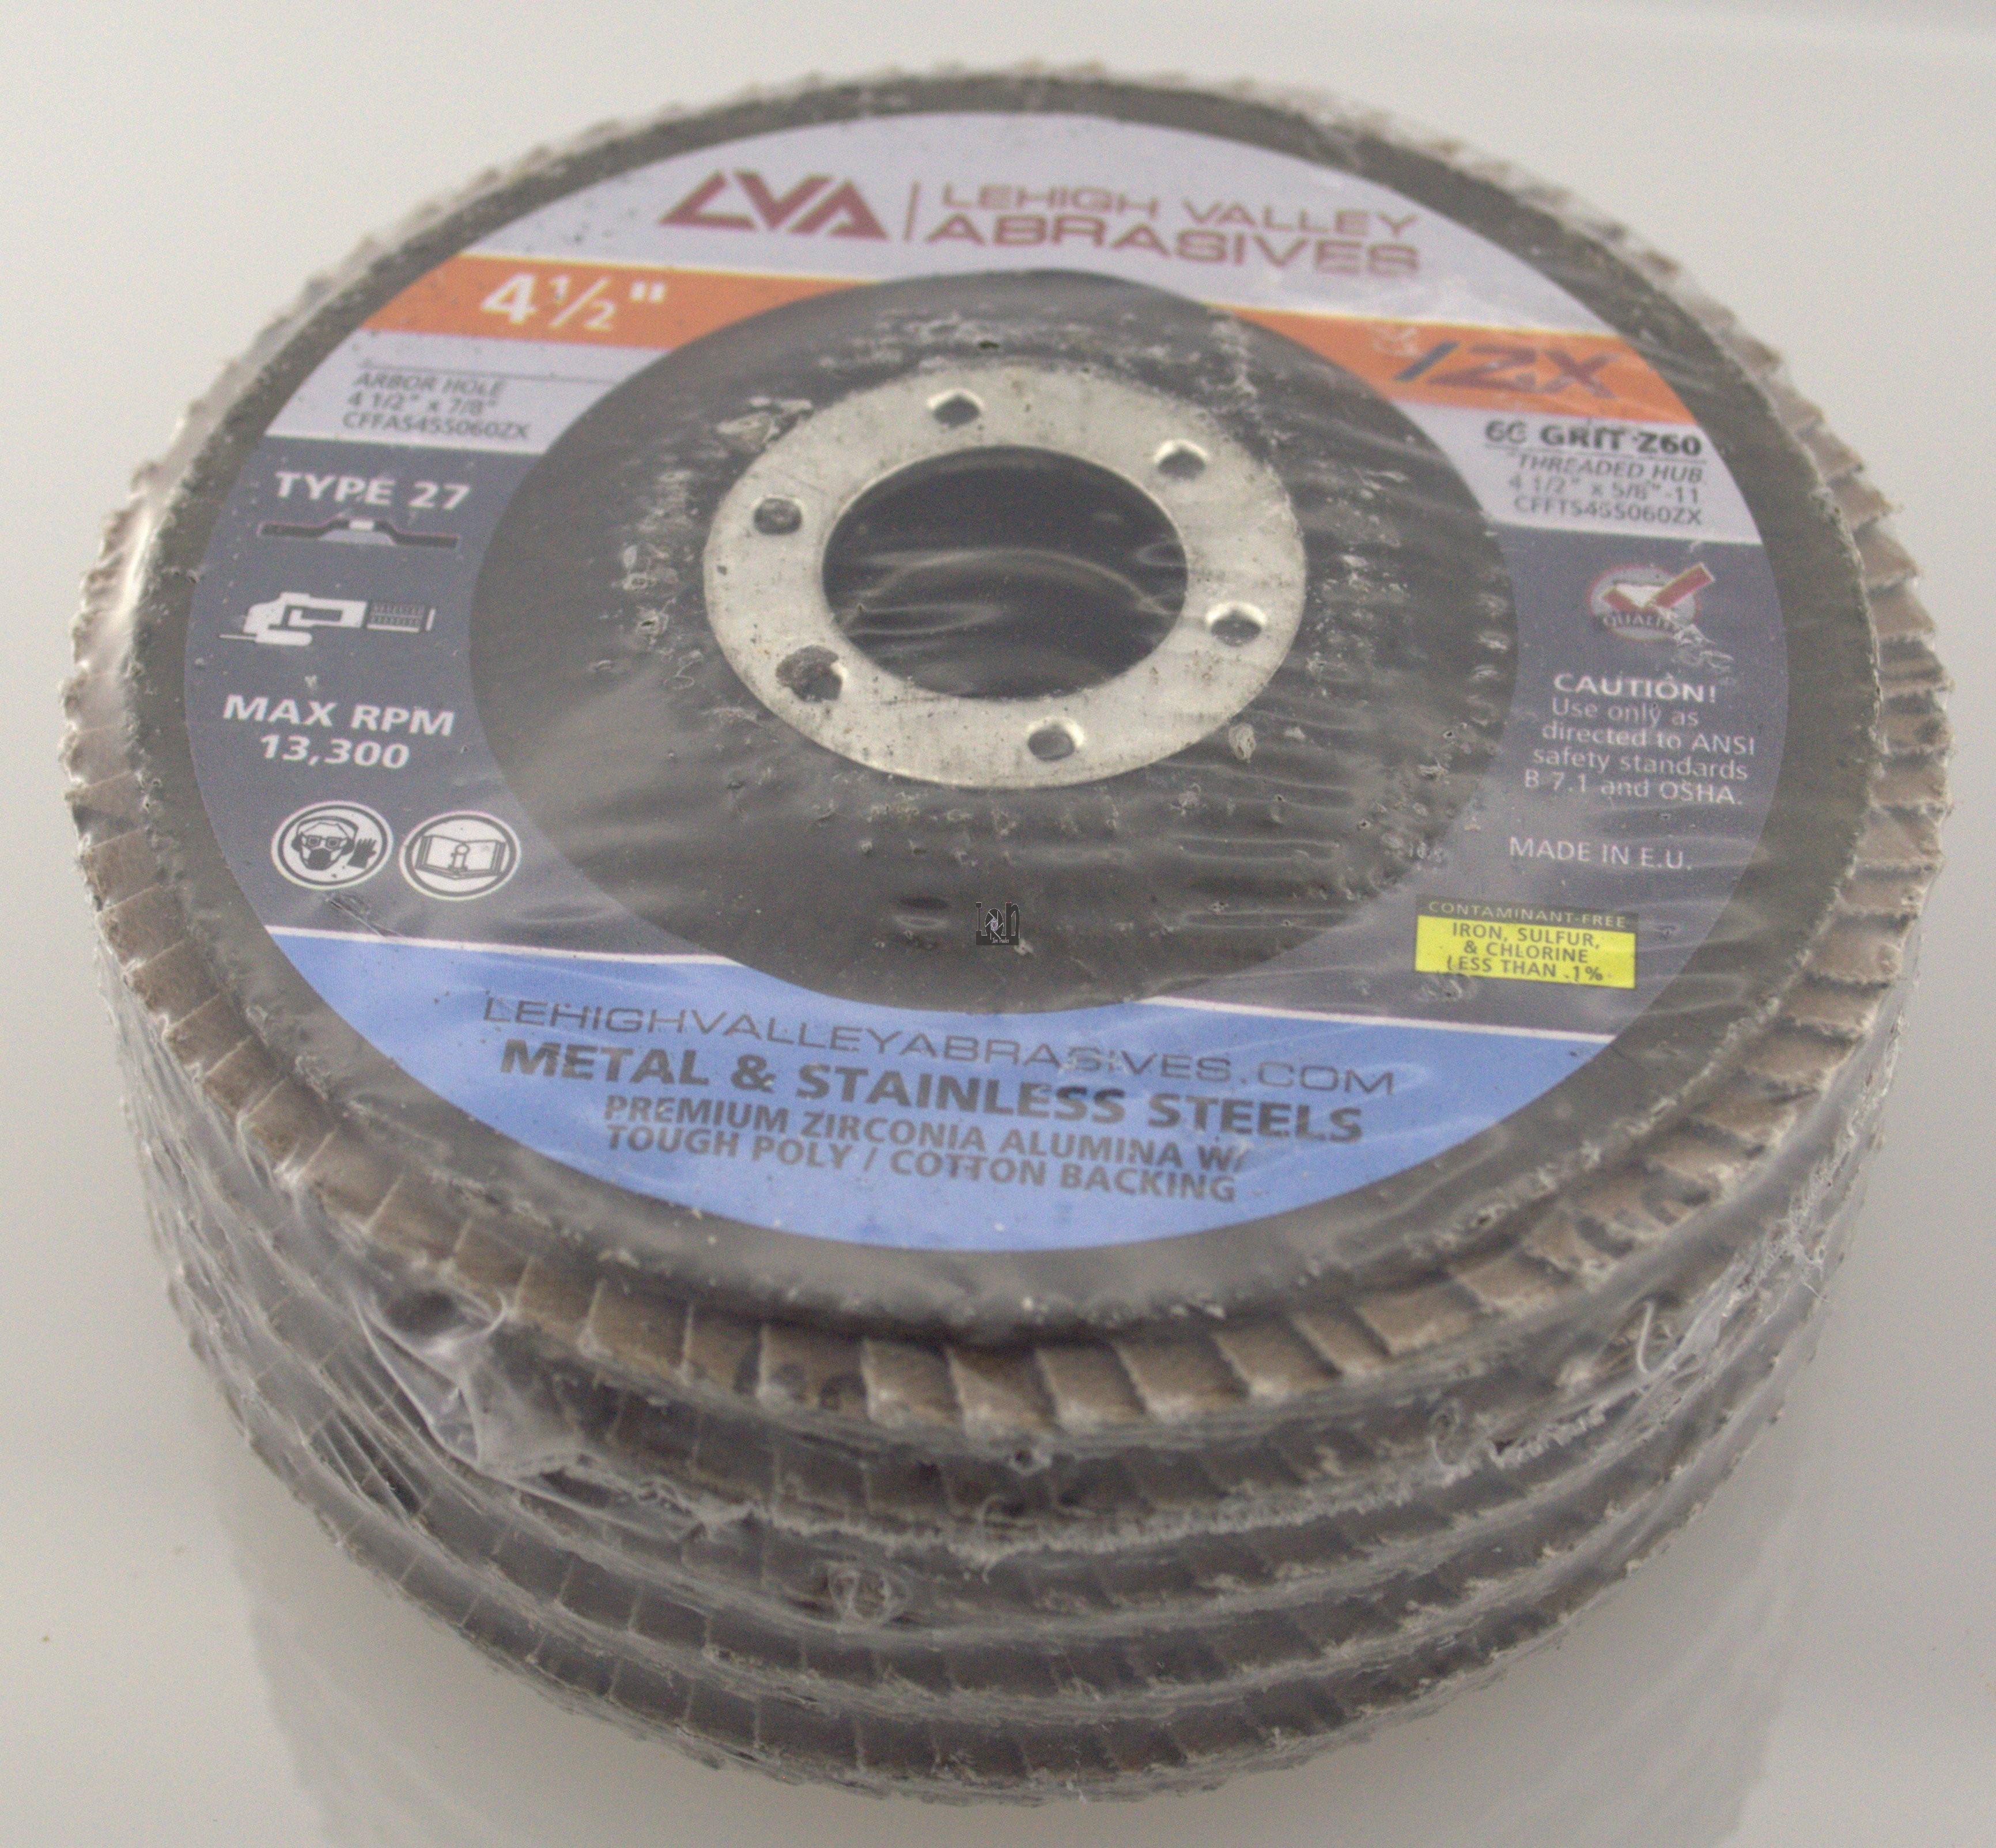 "5pc 60-Grit Flap Disc 60 4-1/2"" Sanding 7/8"" Arbor Grinding Wheels"